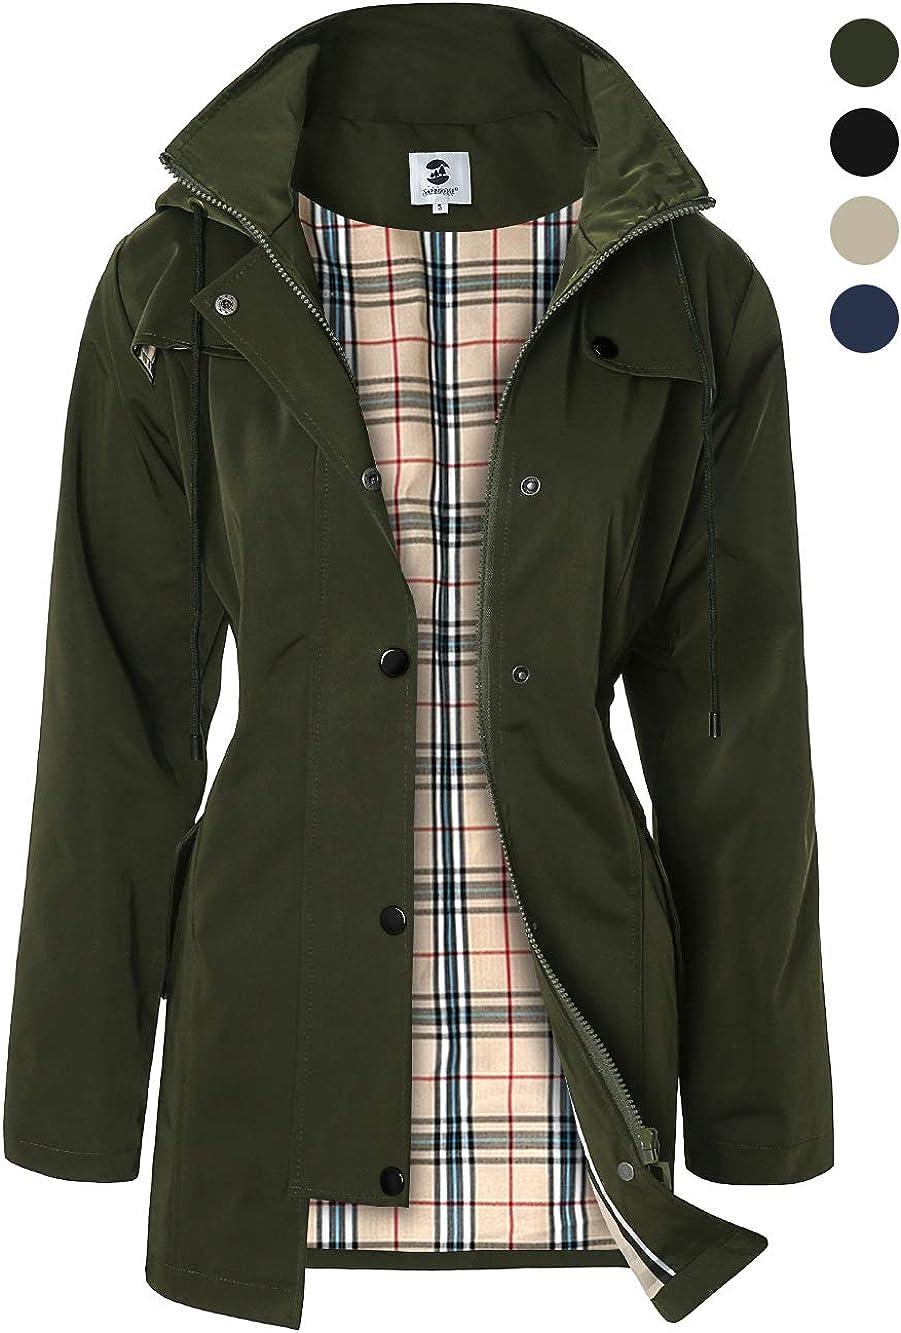 Summer Mae Womens Long Hooded Rain Jacket Outdoor Raincoat Windbreaker